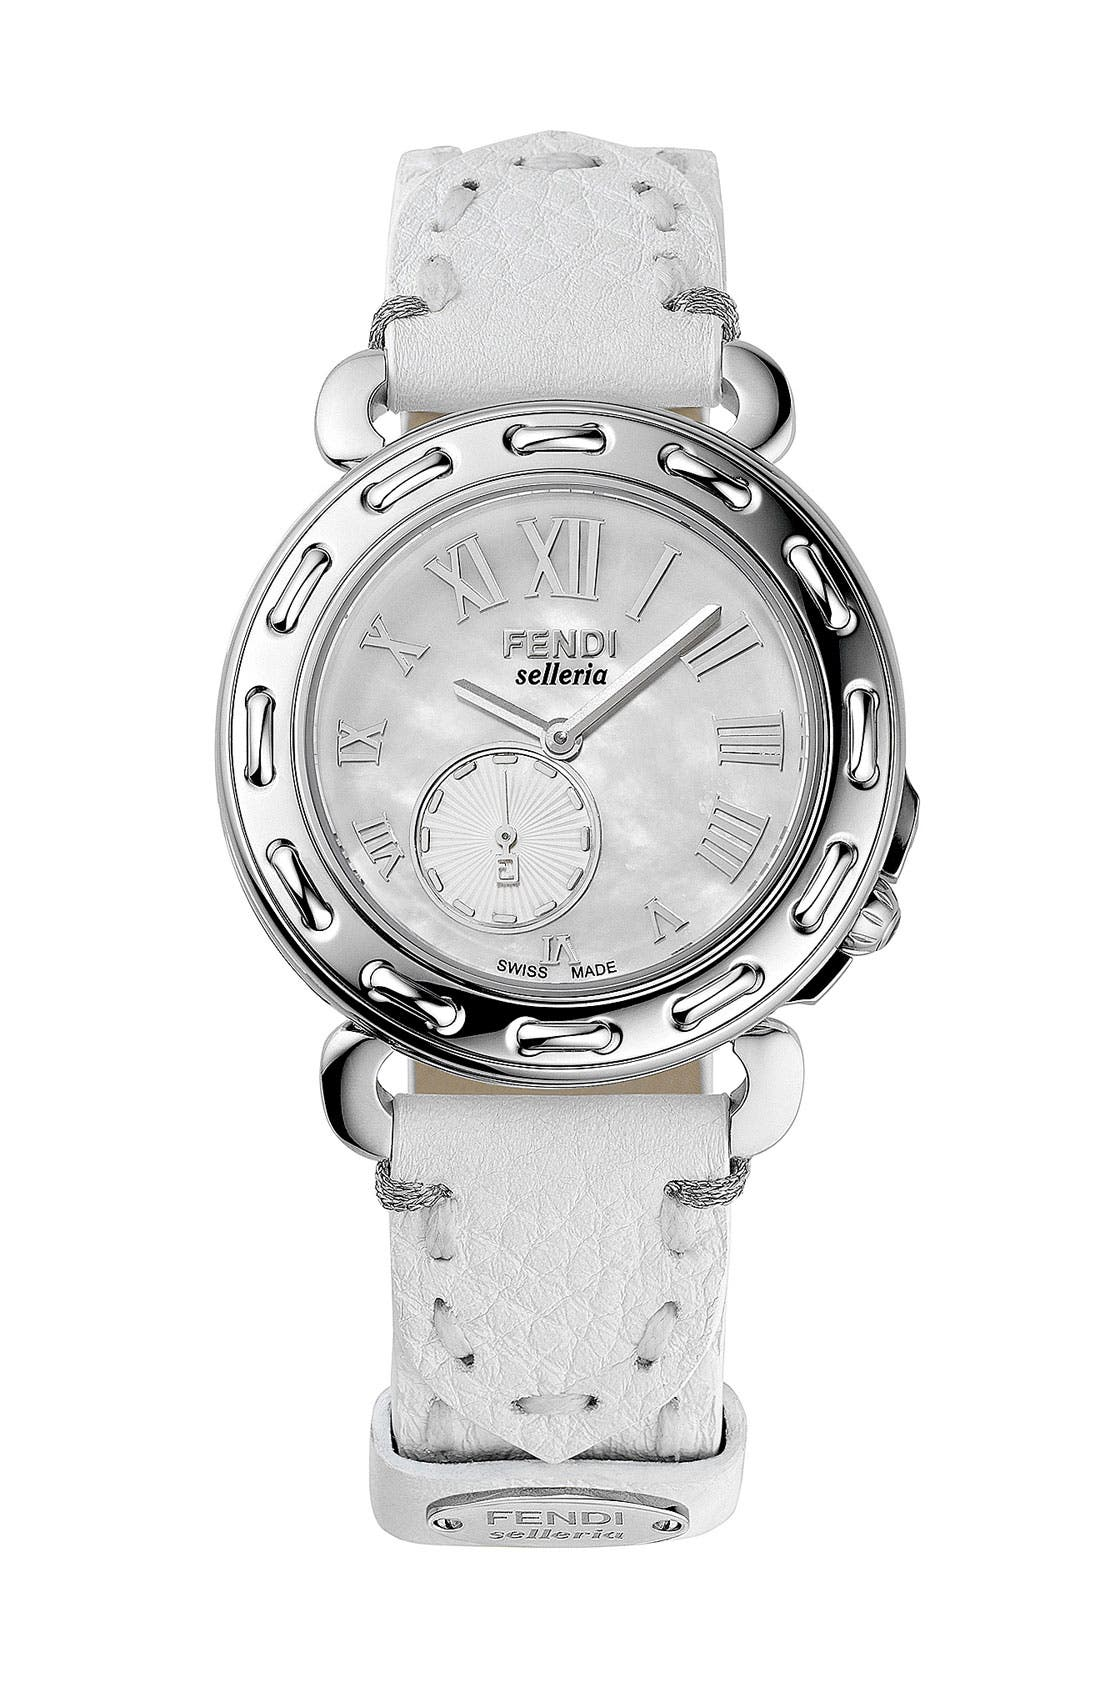 Alternate Image 2  - Fendi 'Selleria' Mother-of-Pearl Watch Case, 46mm